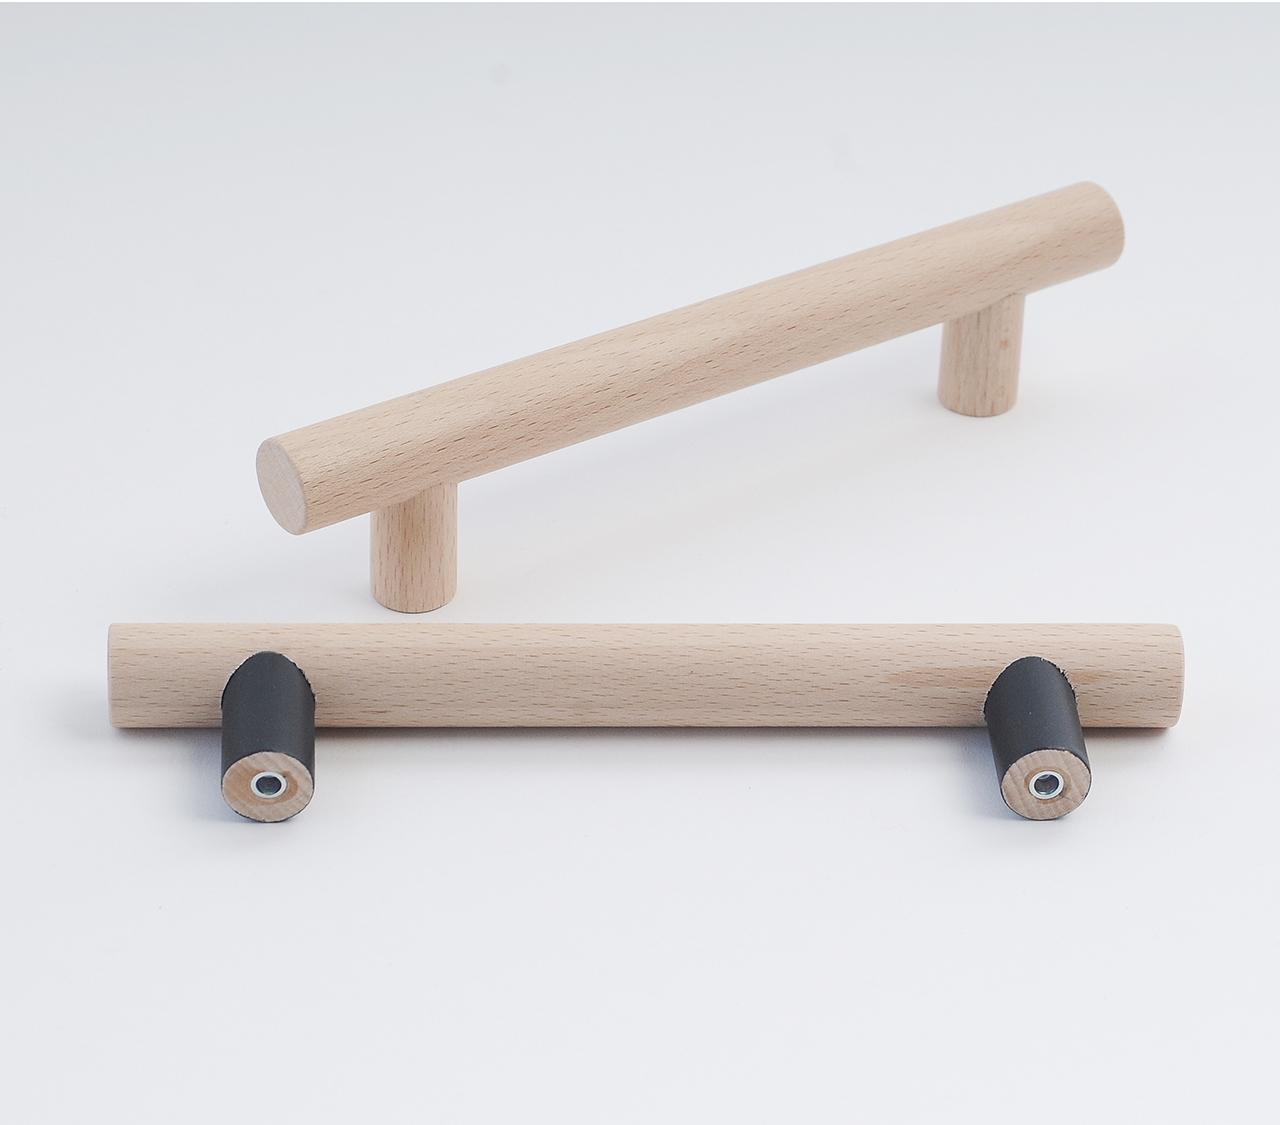 chair design with handle lexor spa furniture handles